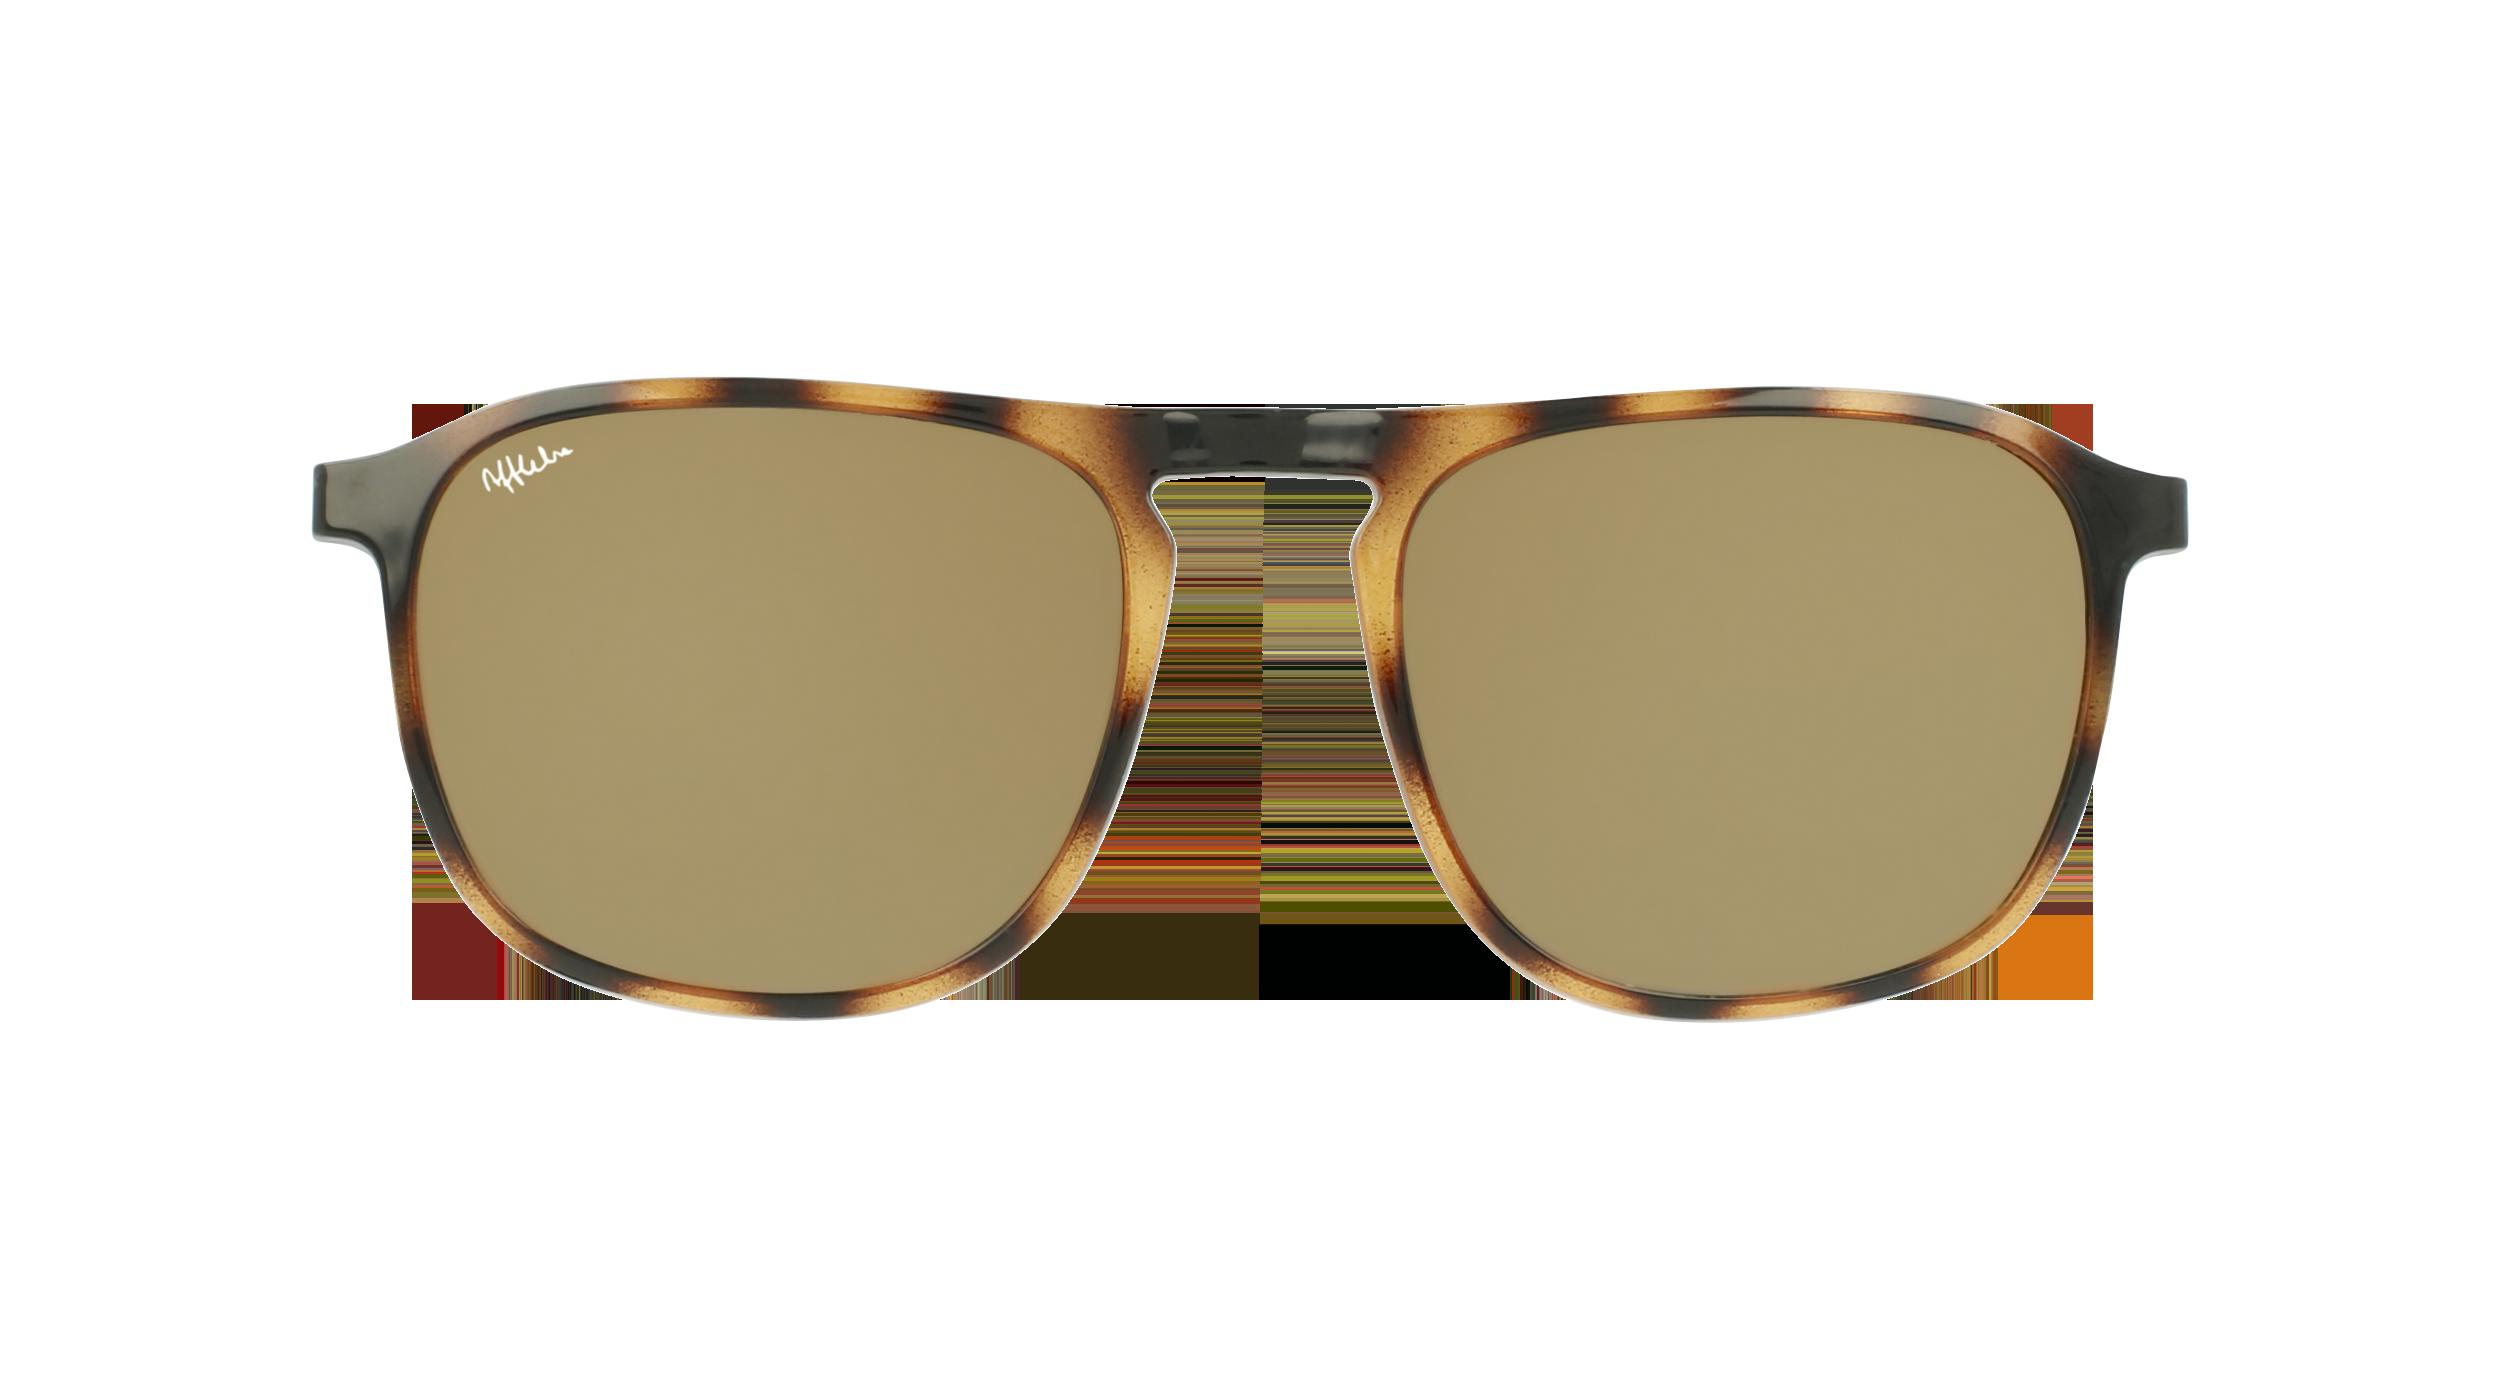 afflelou/france/products/smart_clip/clips_glasses/07630036457214.png